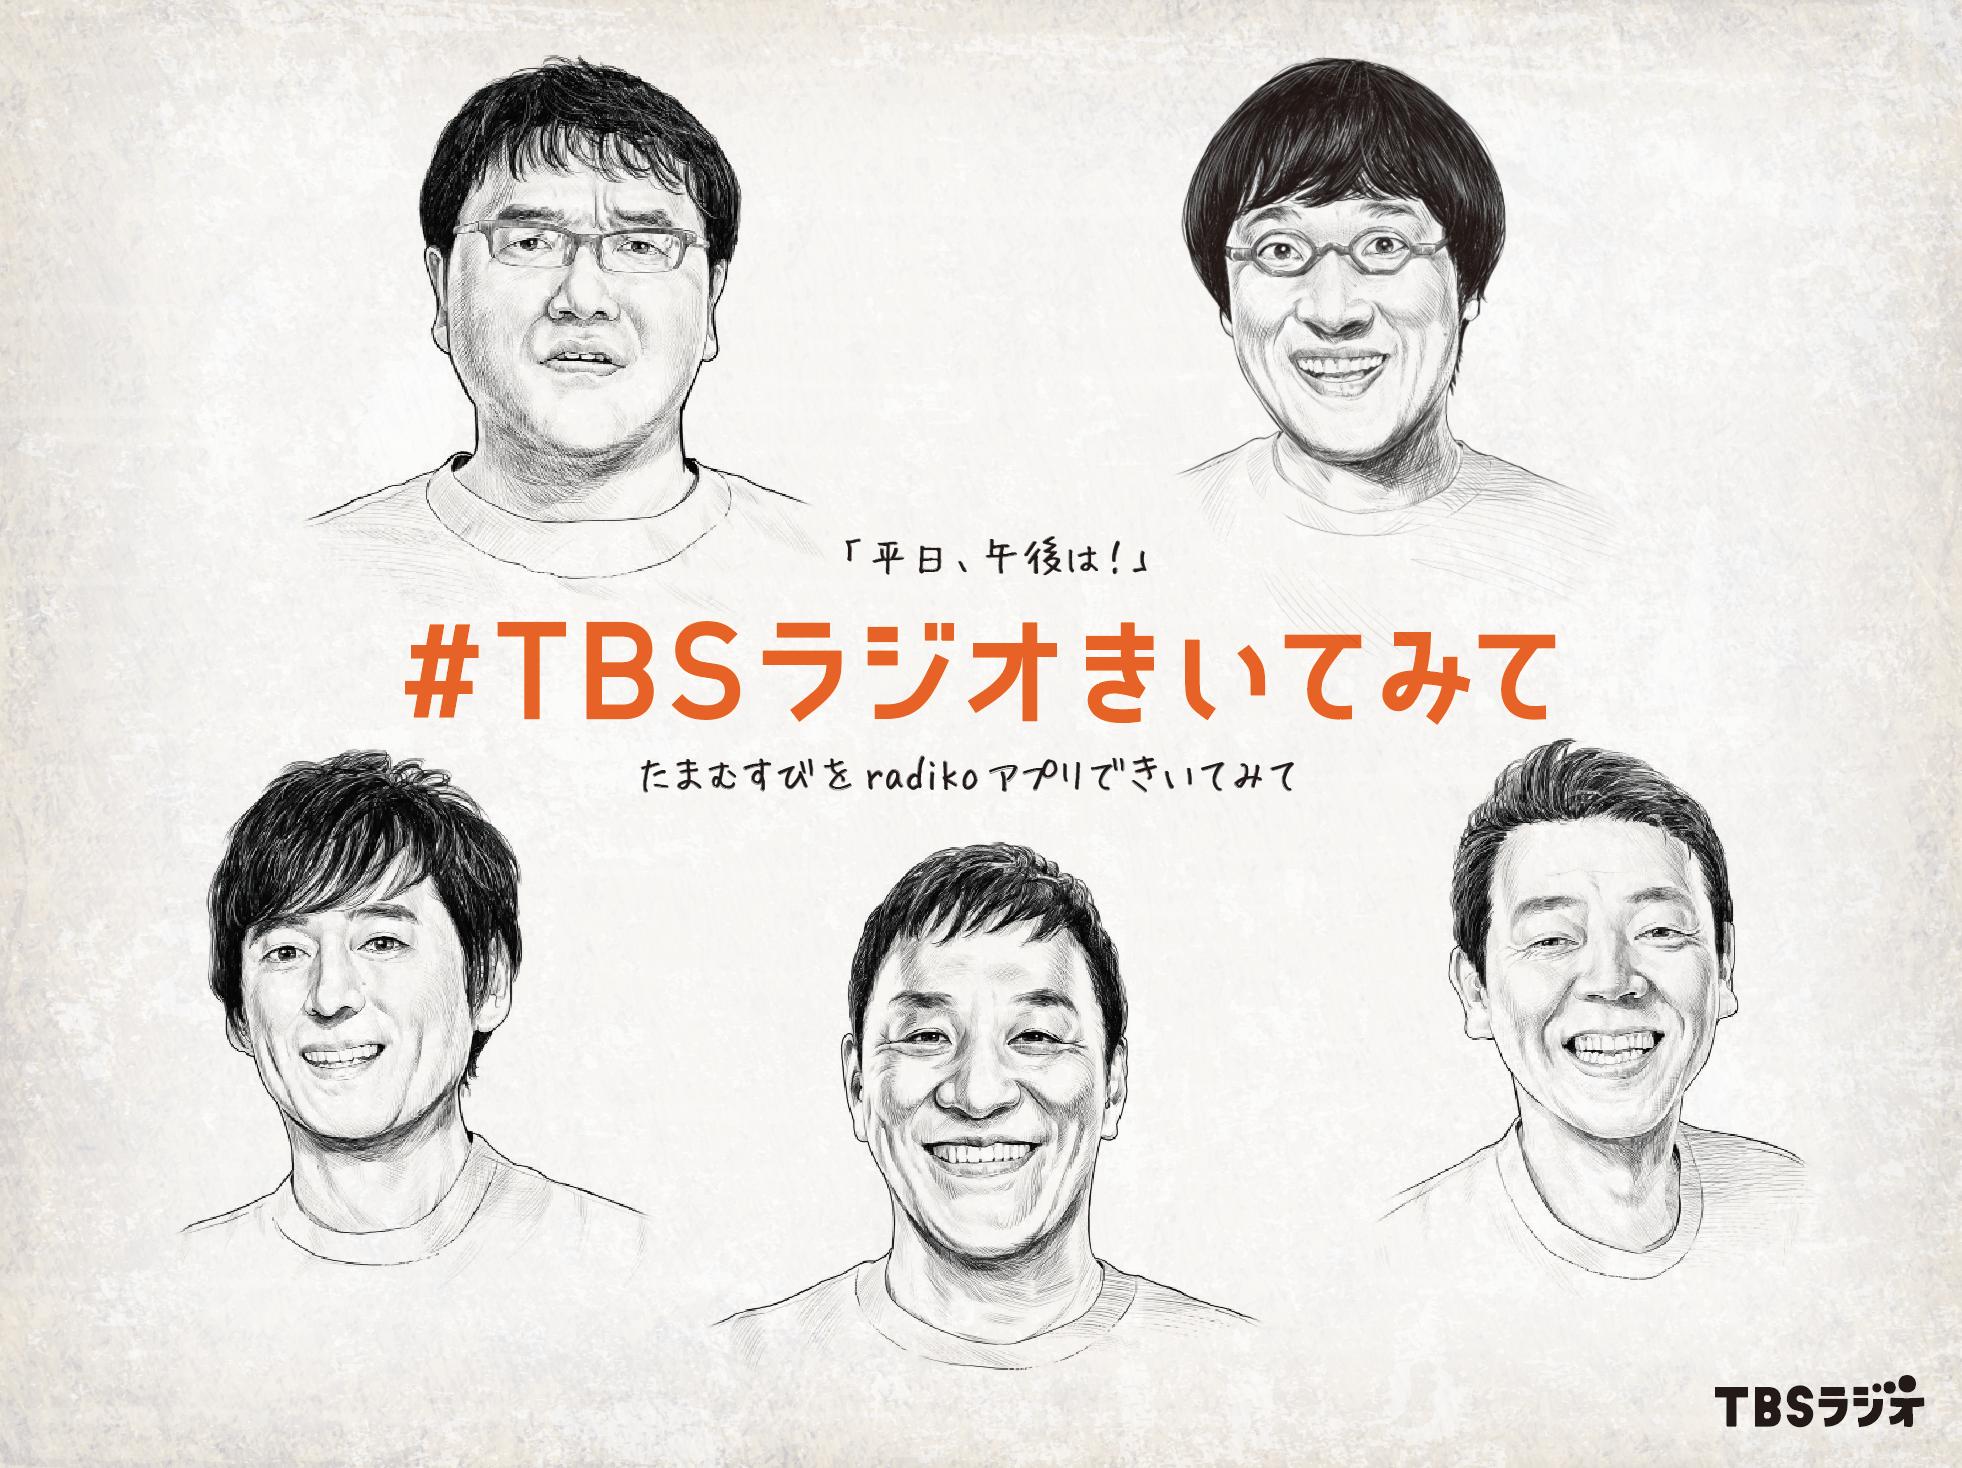 TBS RADIO / #TBSラジオきいてみて 広告キャンペーン5